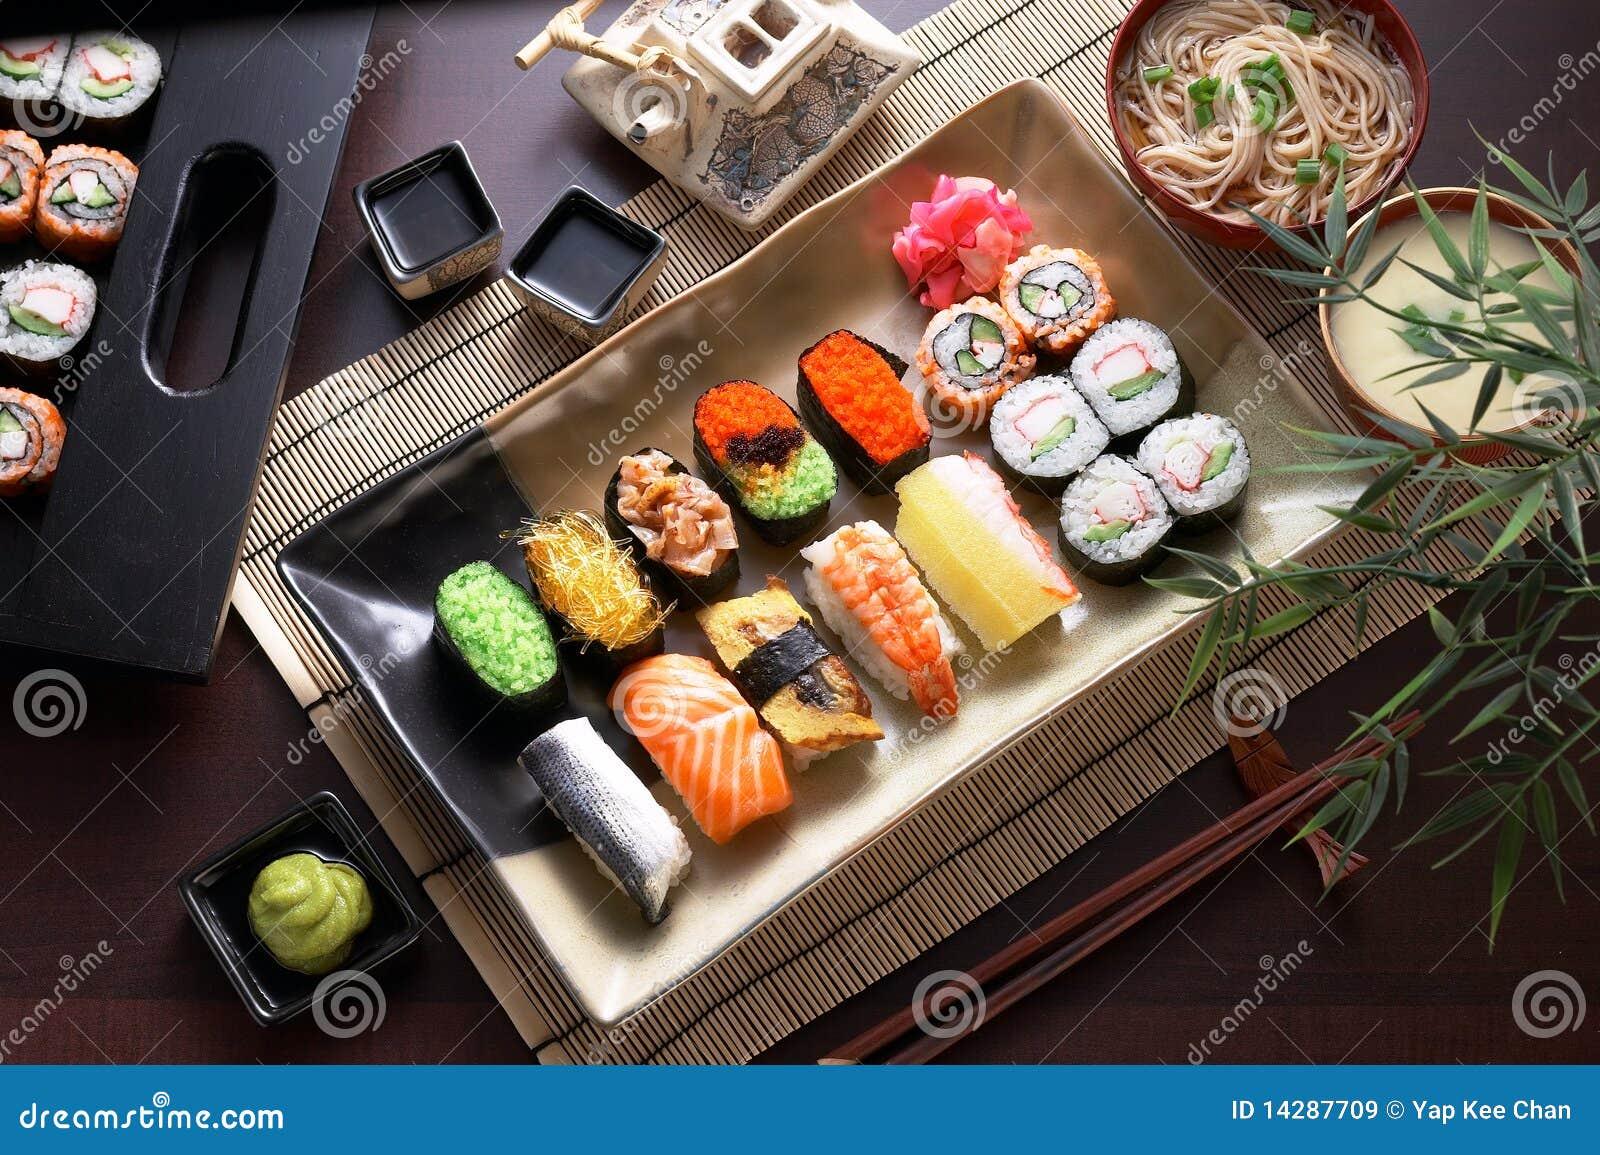 Sushi Platter on Auto Mechanic Car Repair